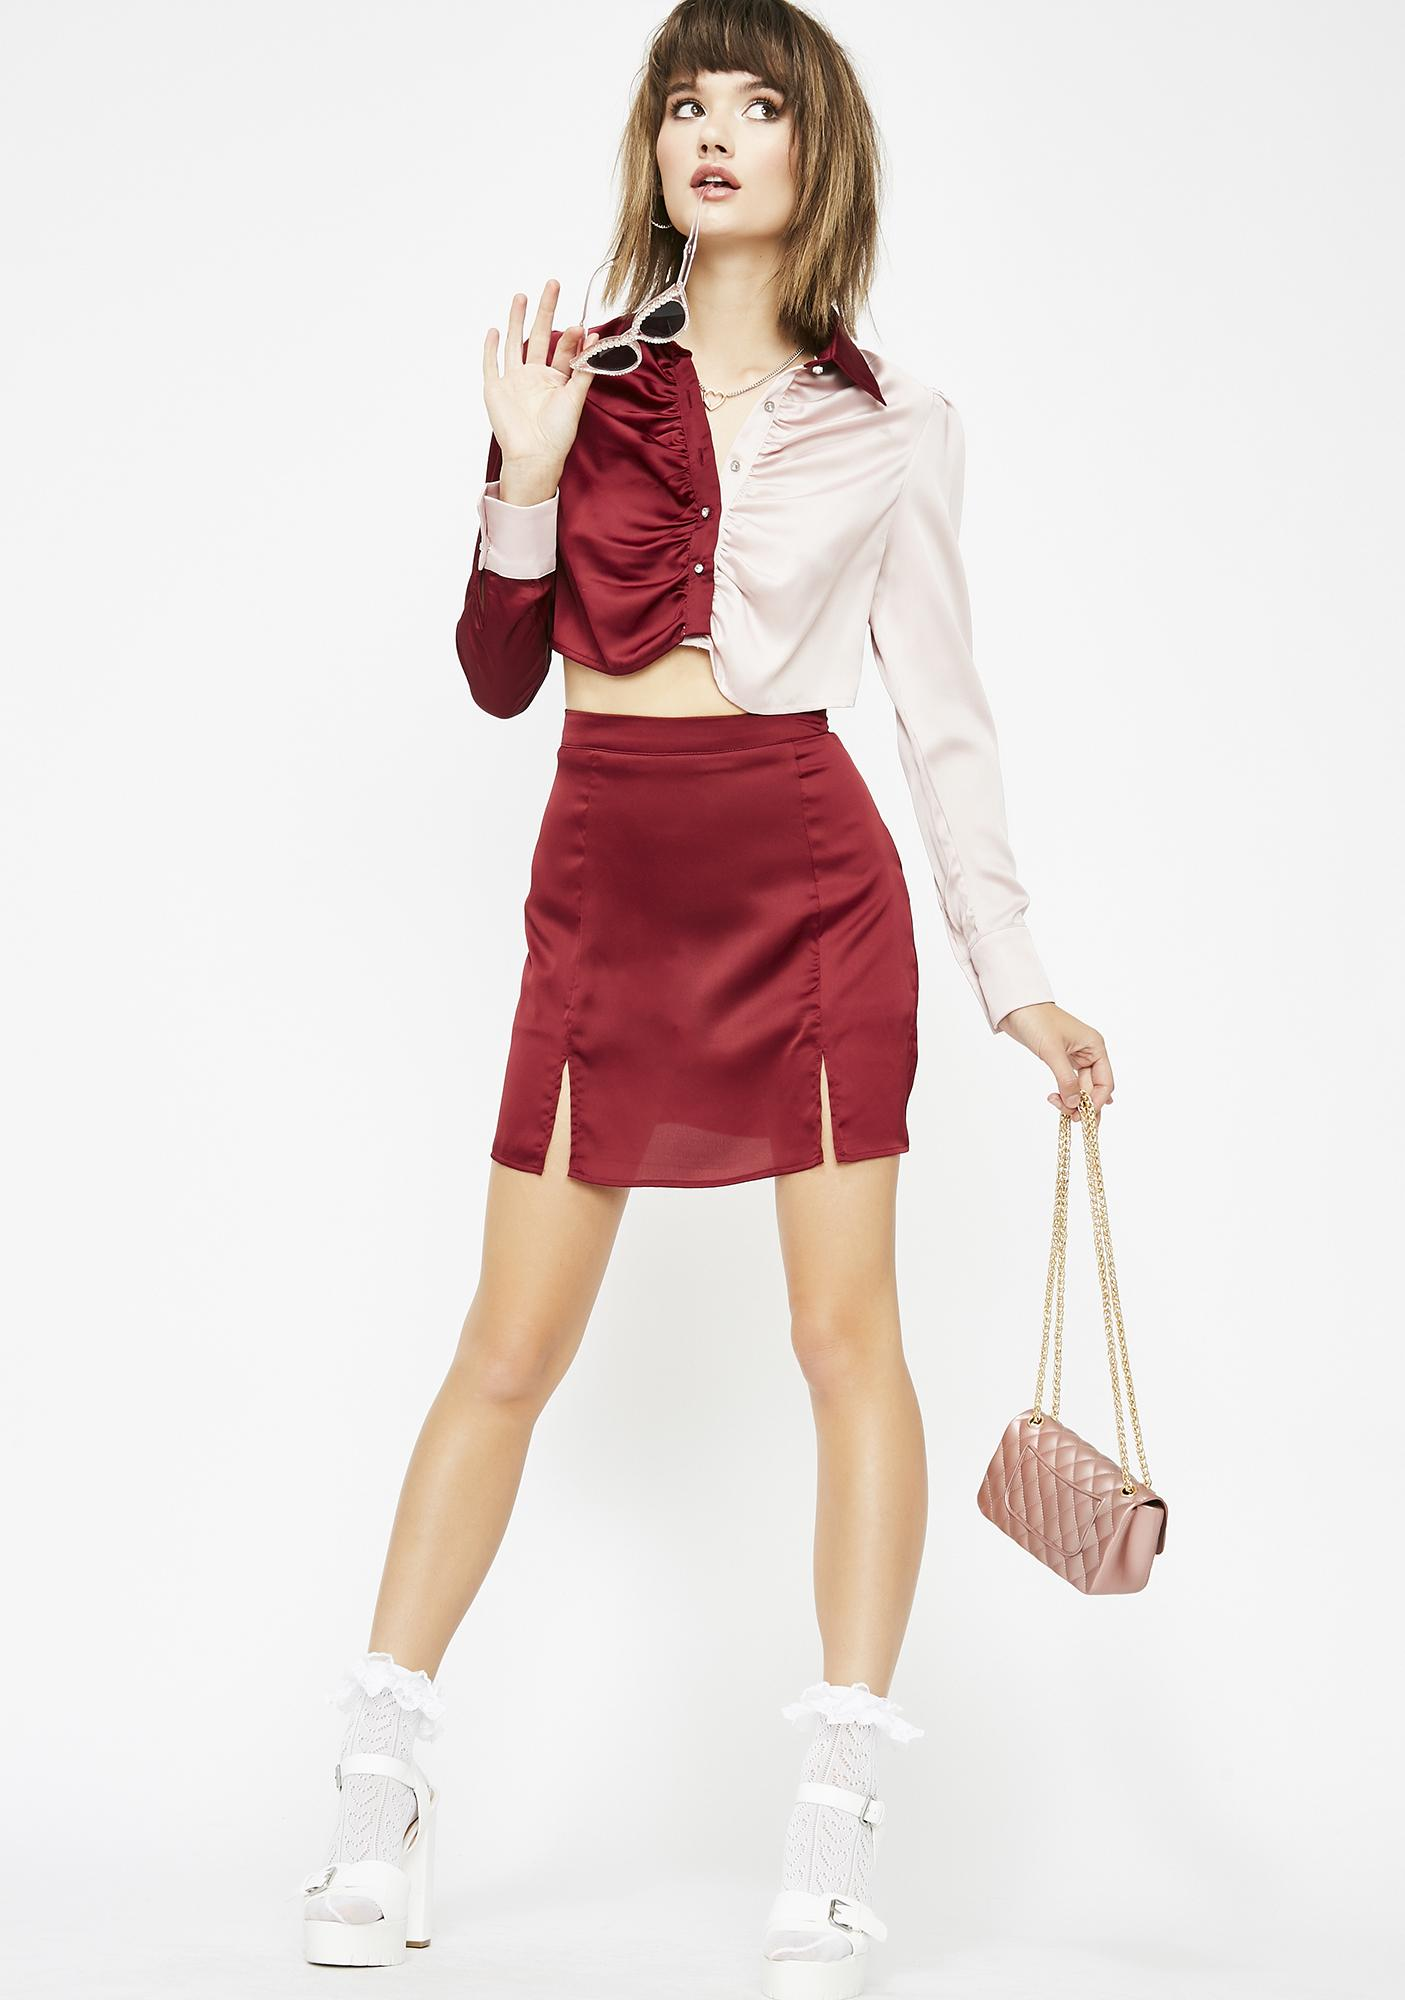 Saucy Lady Satin Skirt